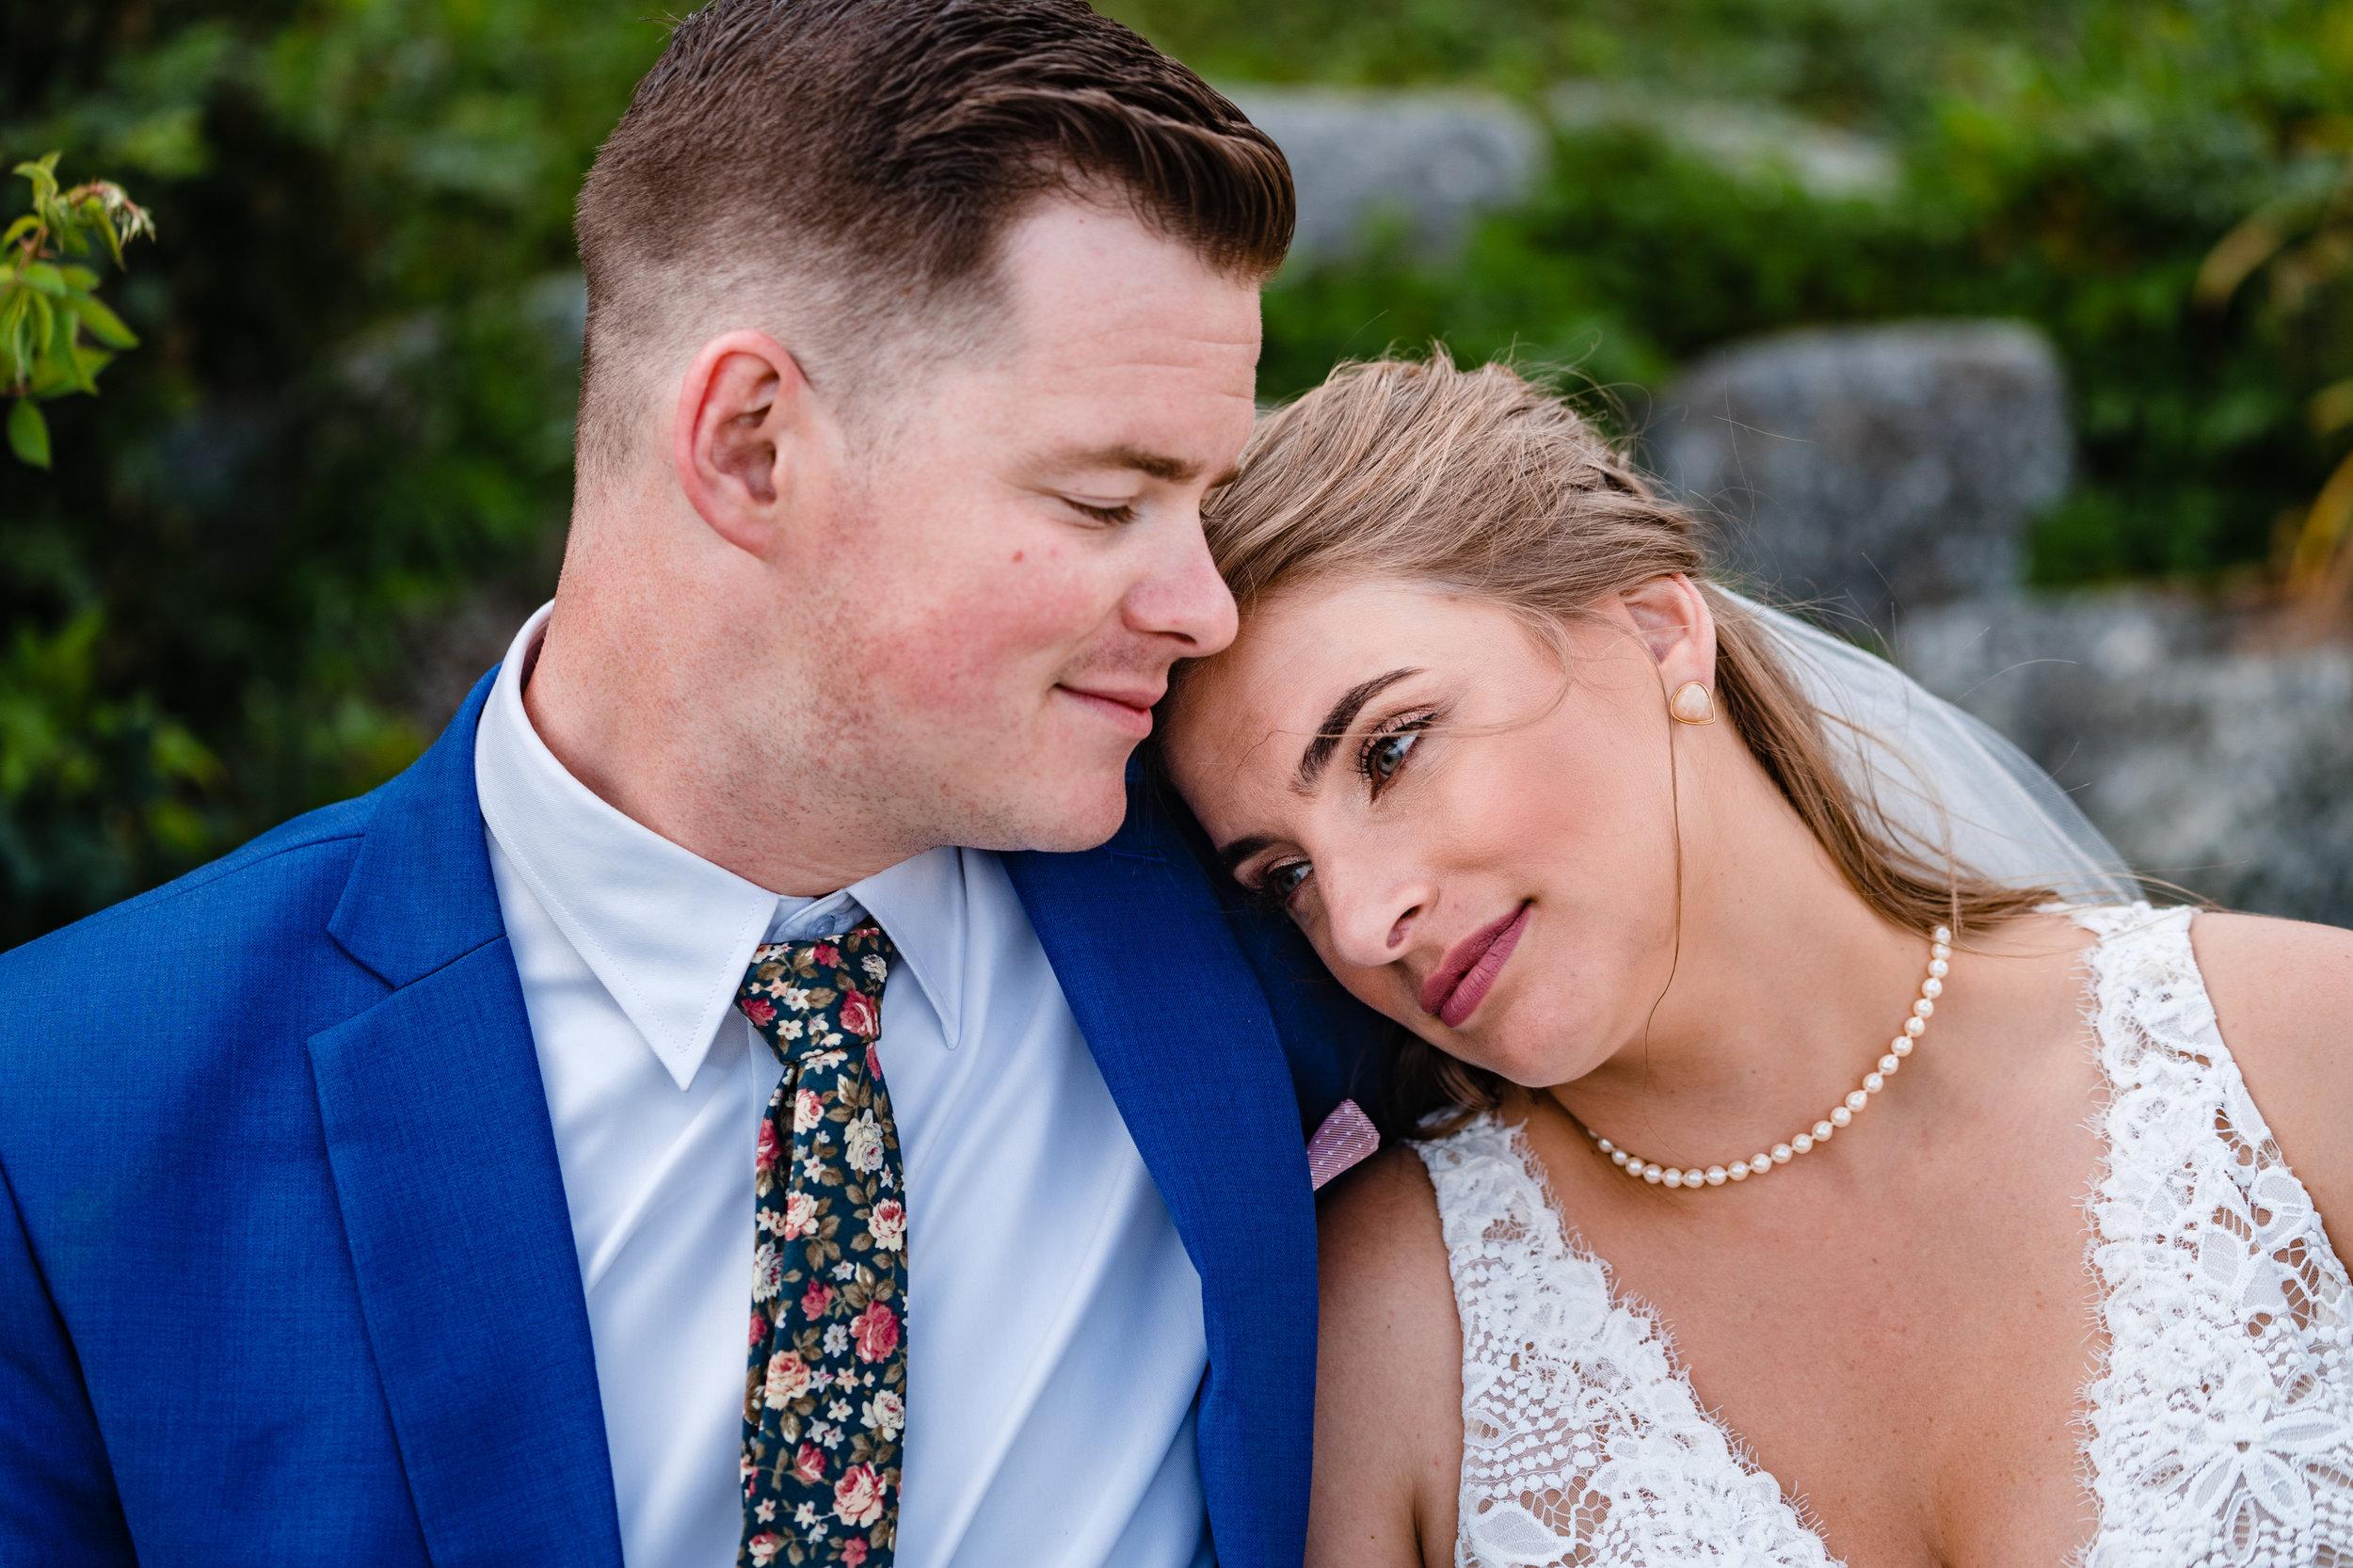 Janelle-Mitch-Halifax-Wedding-Nova-Scotia-Photography (76 of 163).jpg